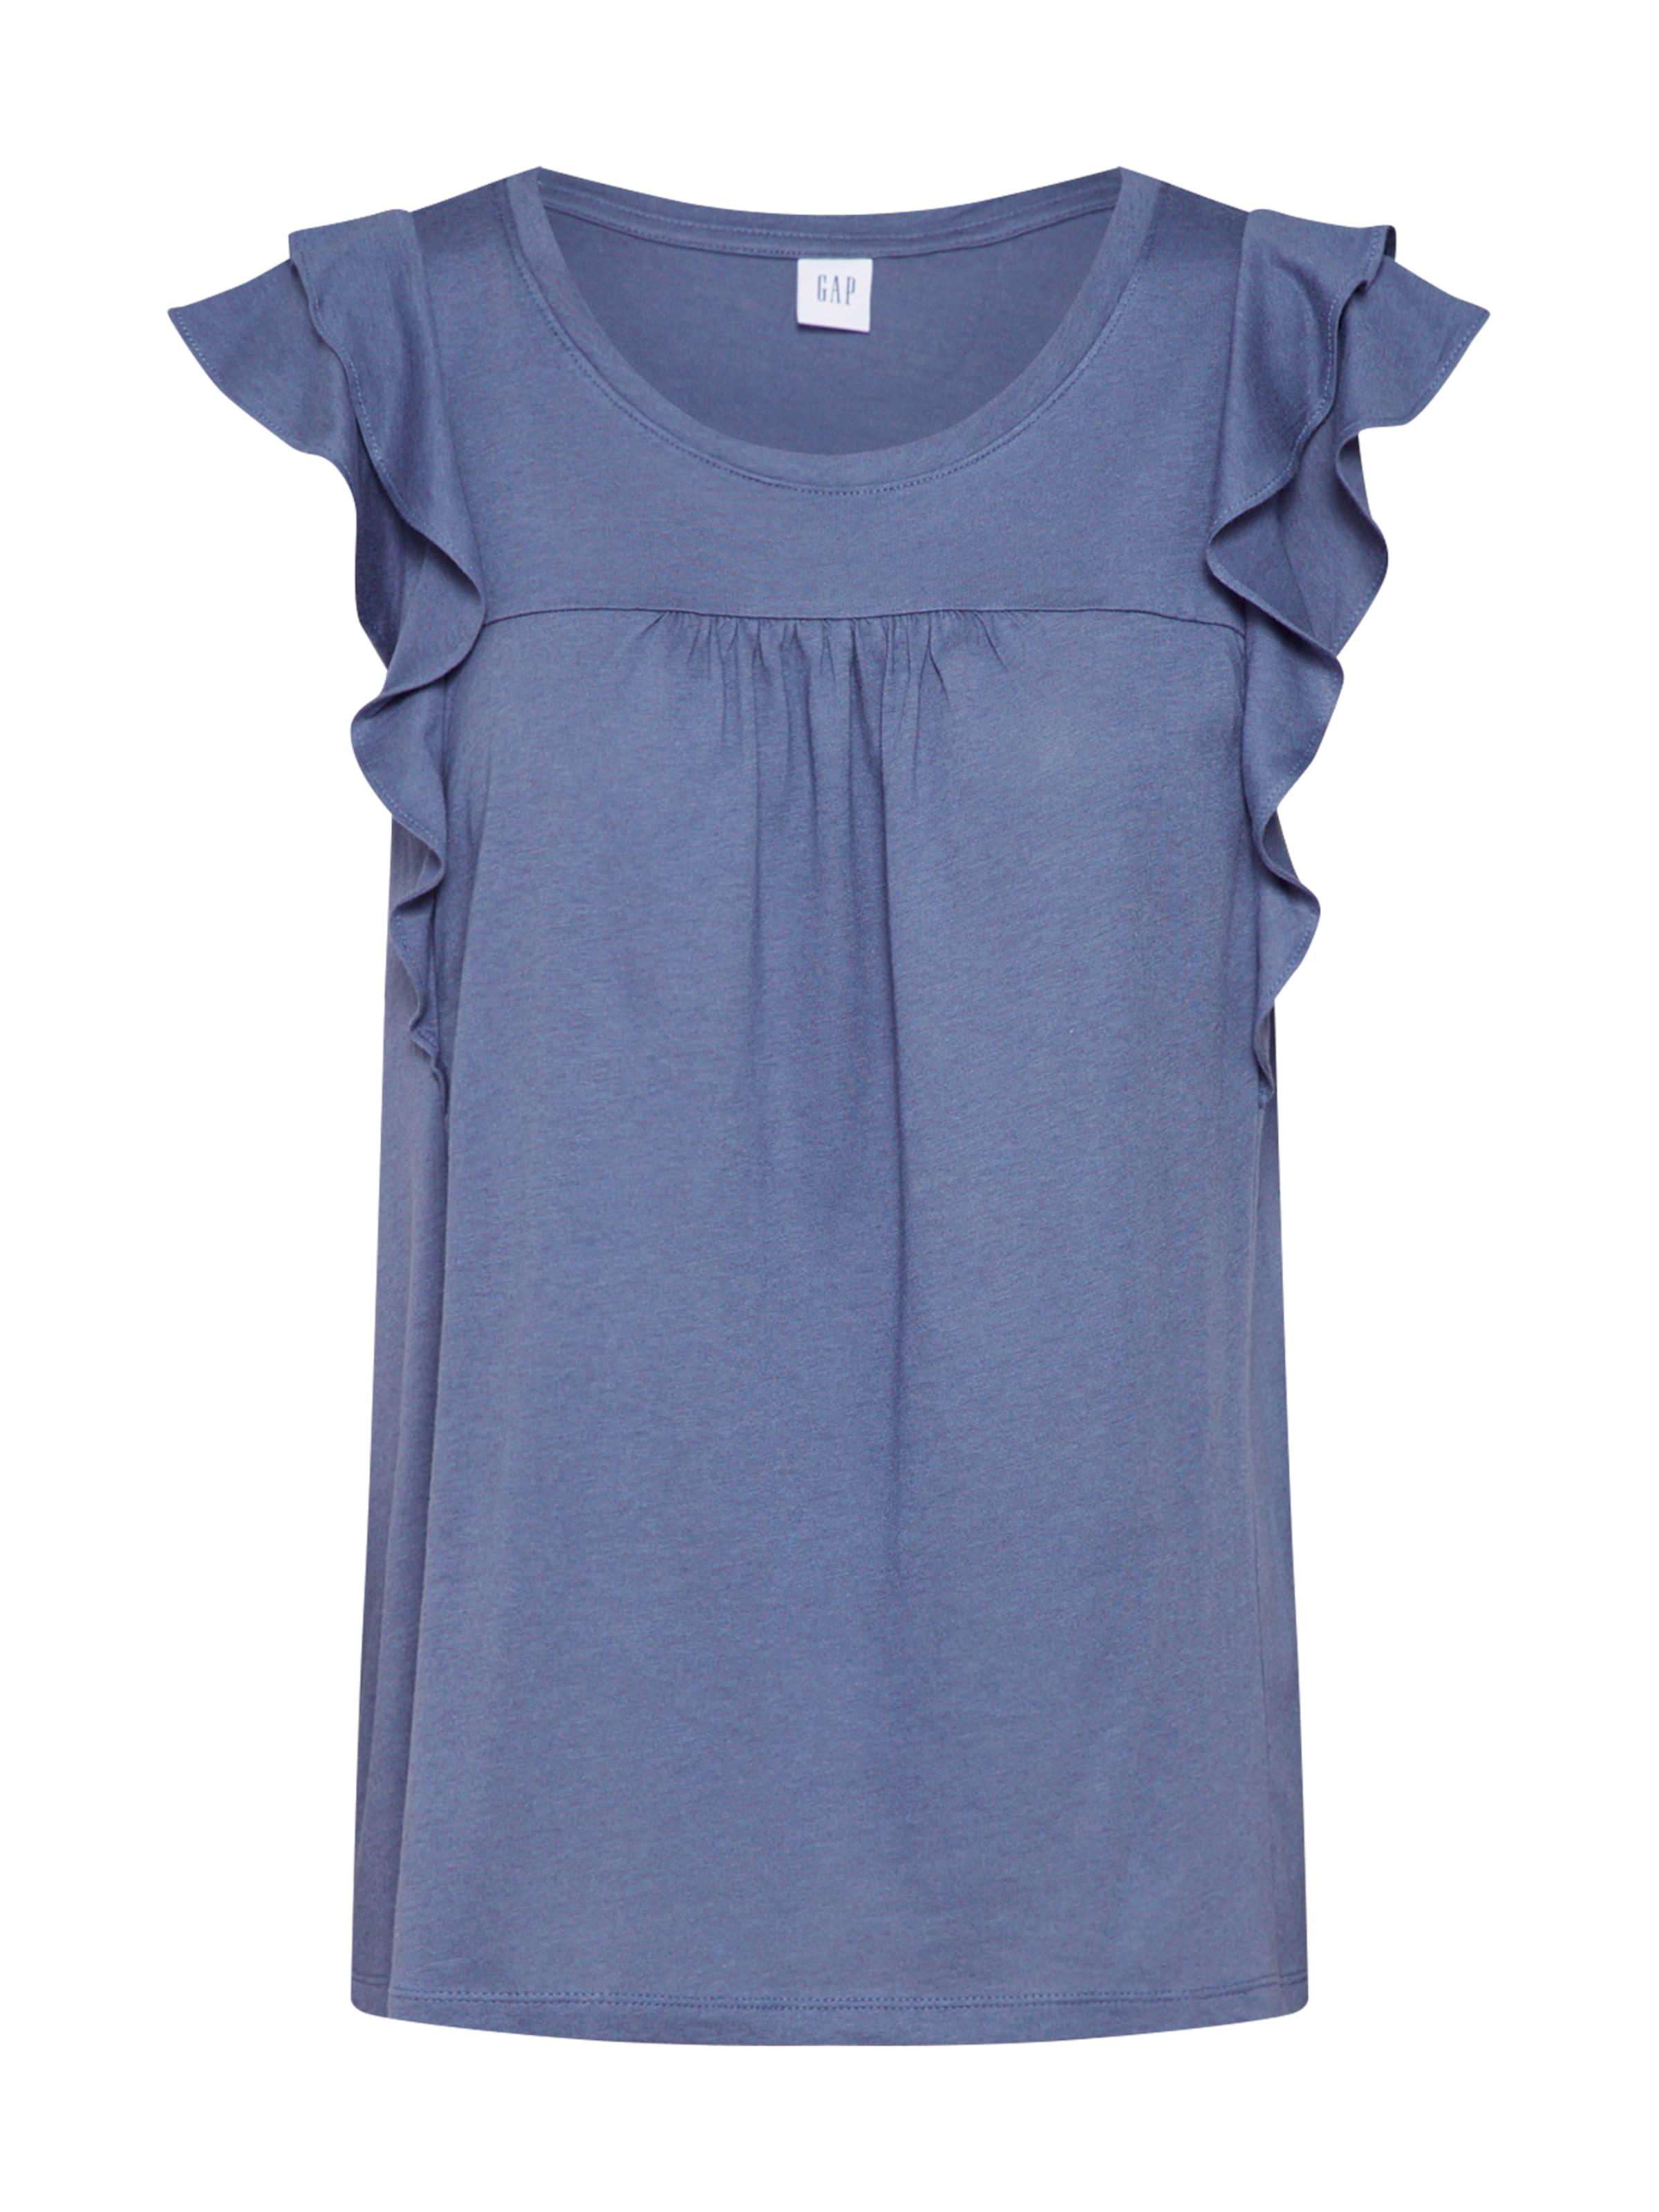 En T shirt Bleu Fumé Gap E9DWYH2I